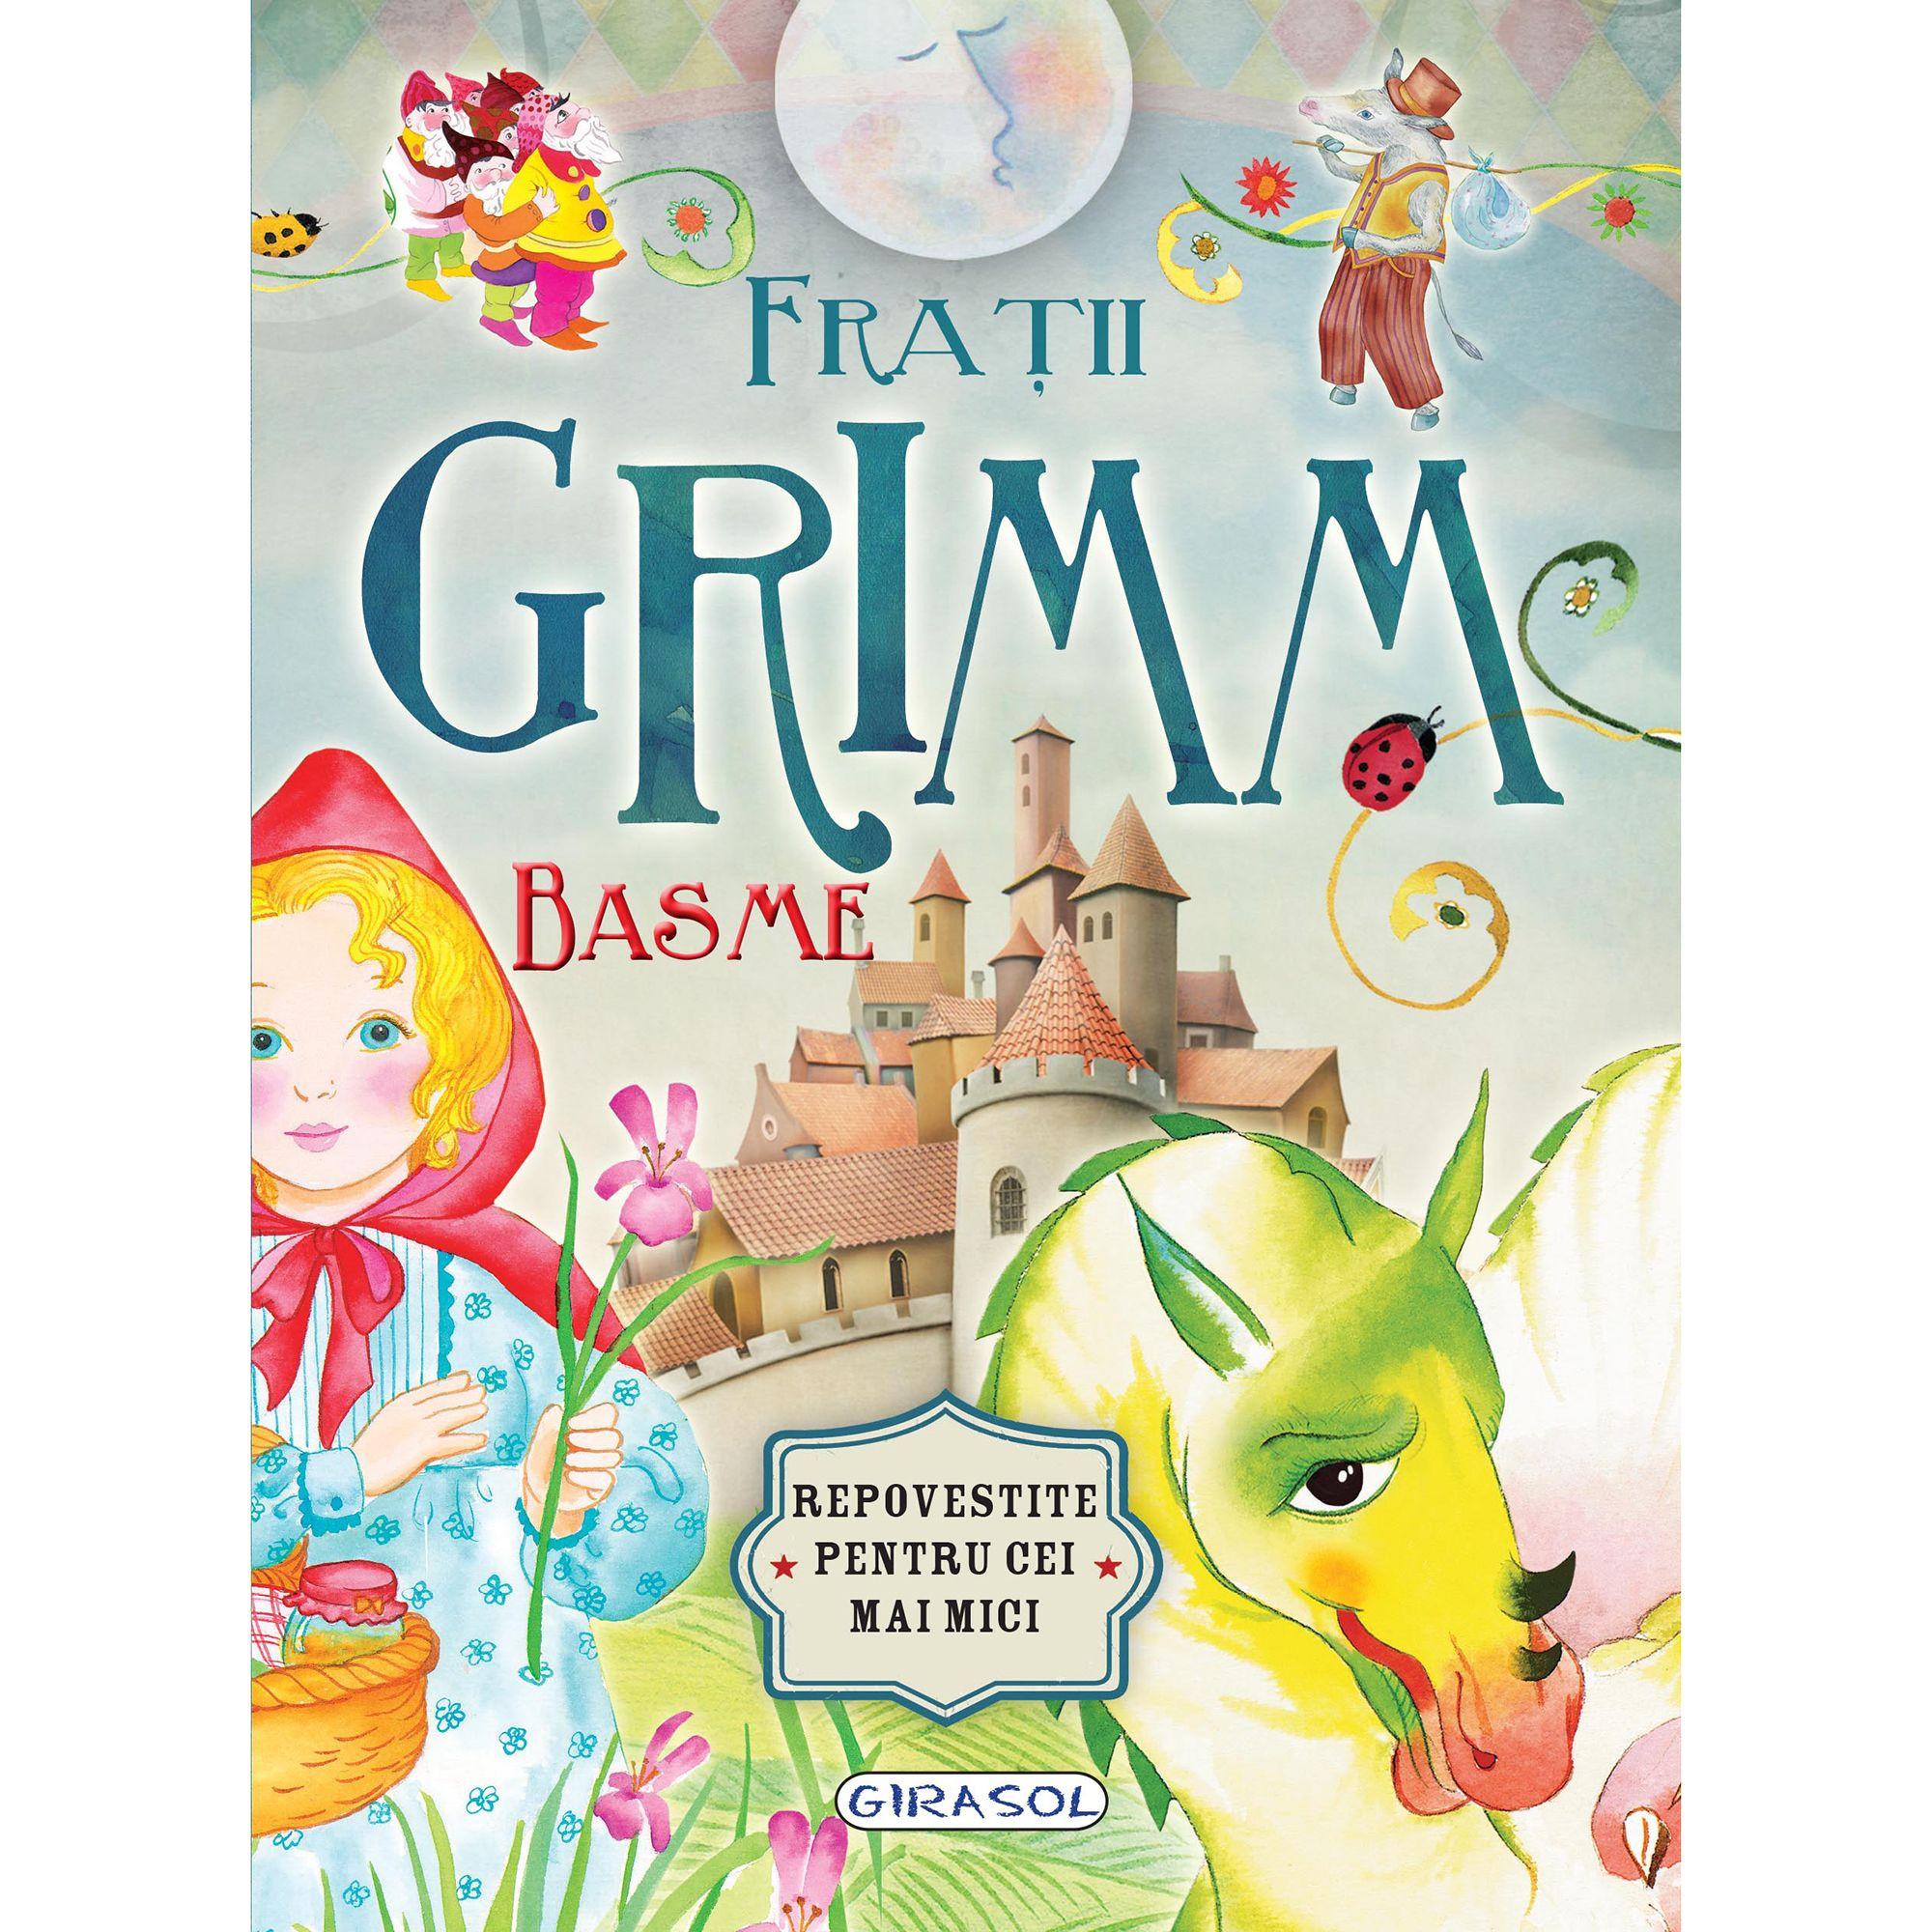 Frații Grimm BASME